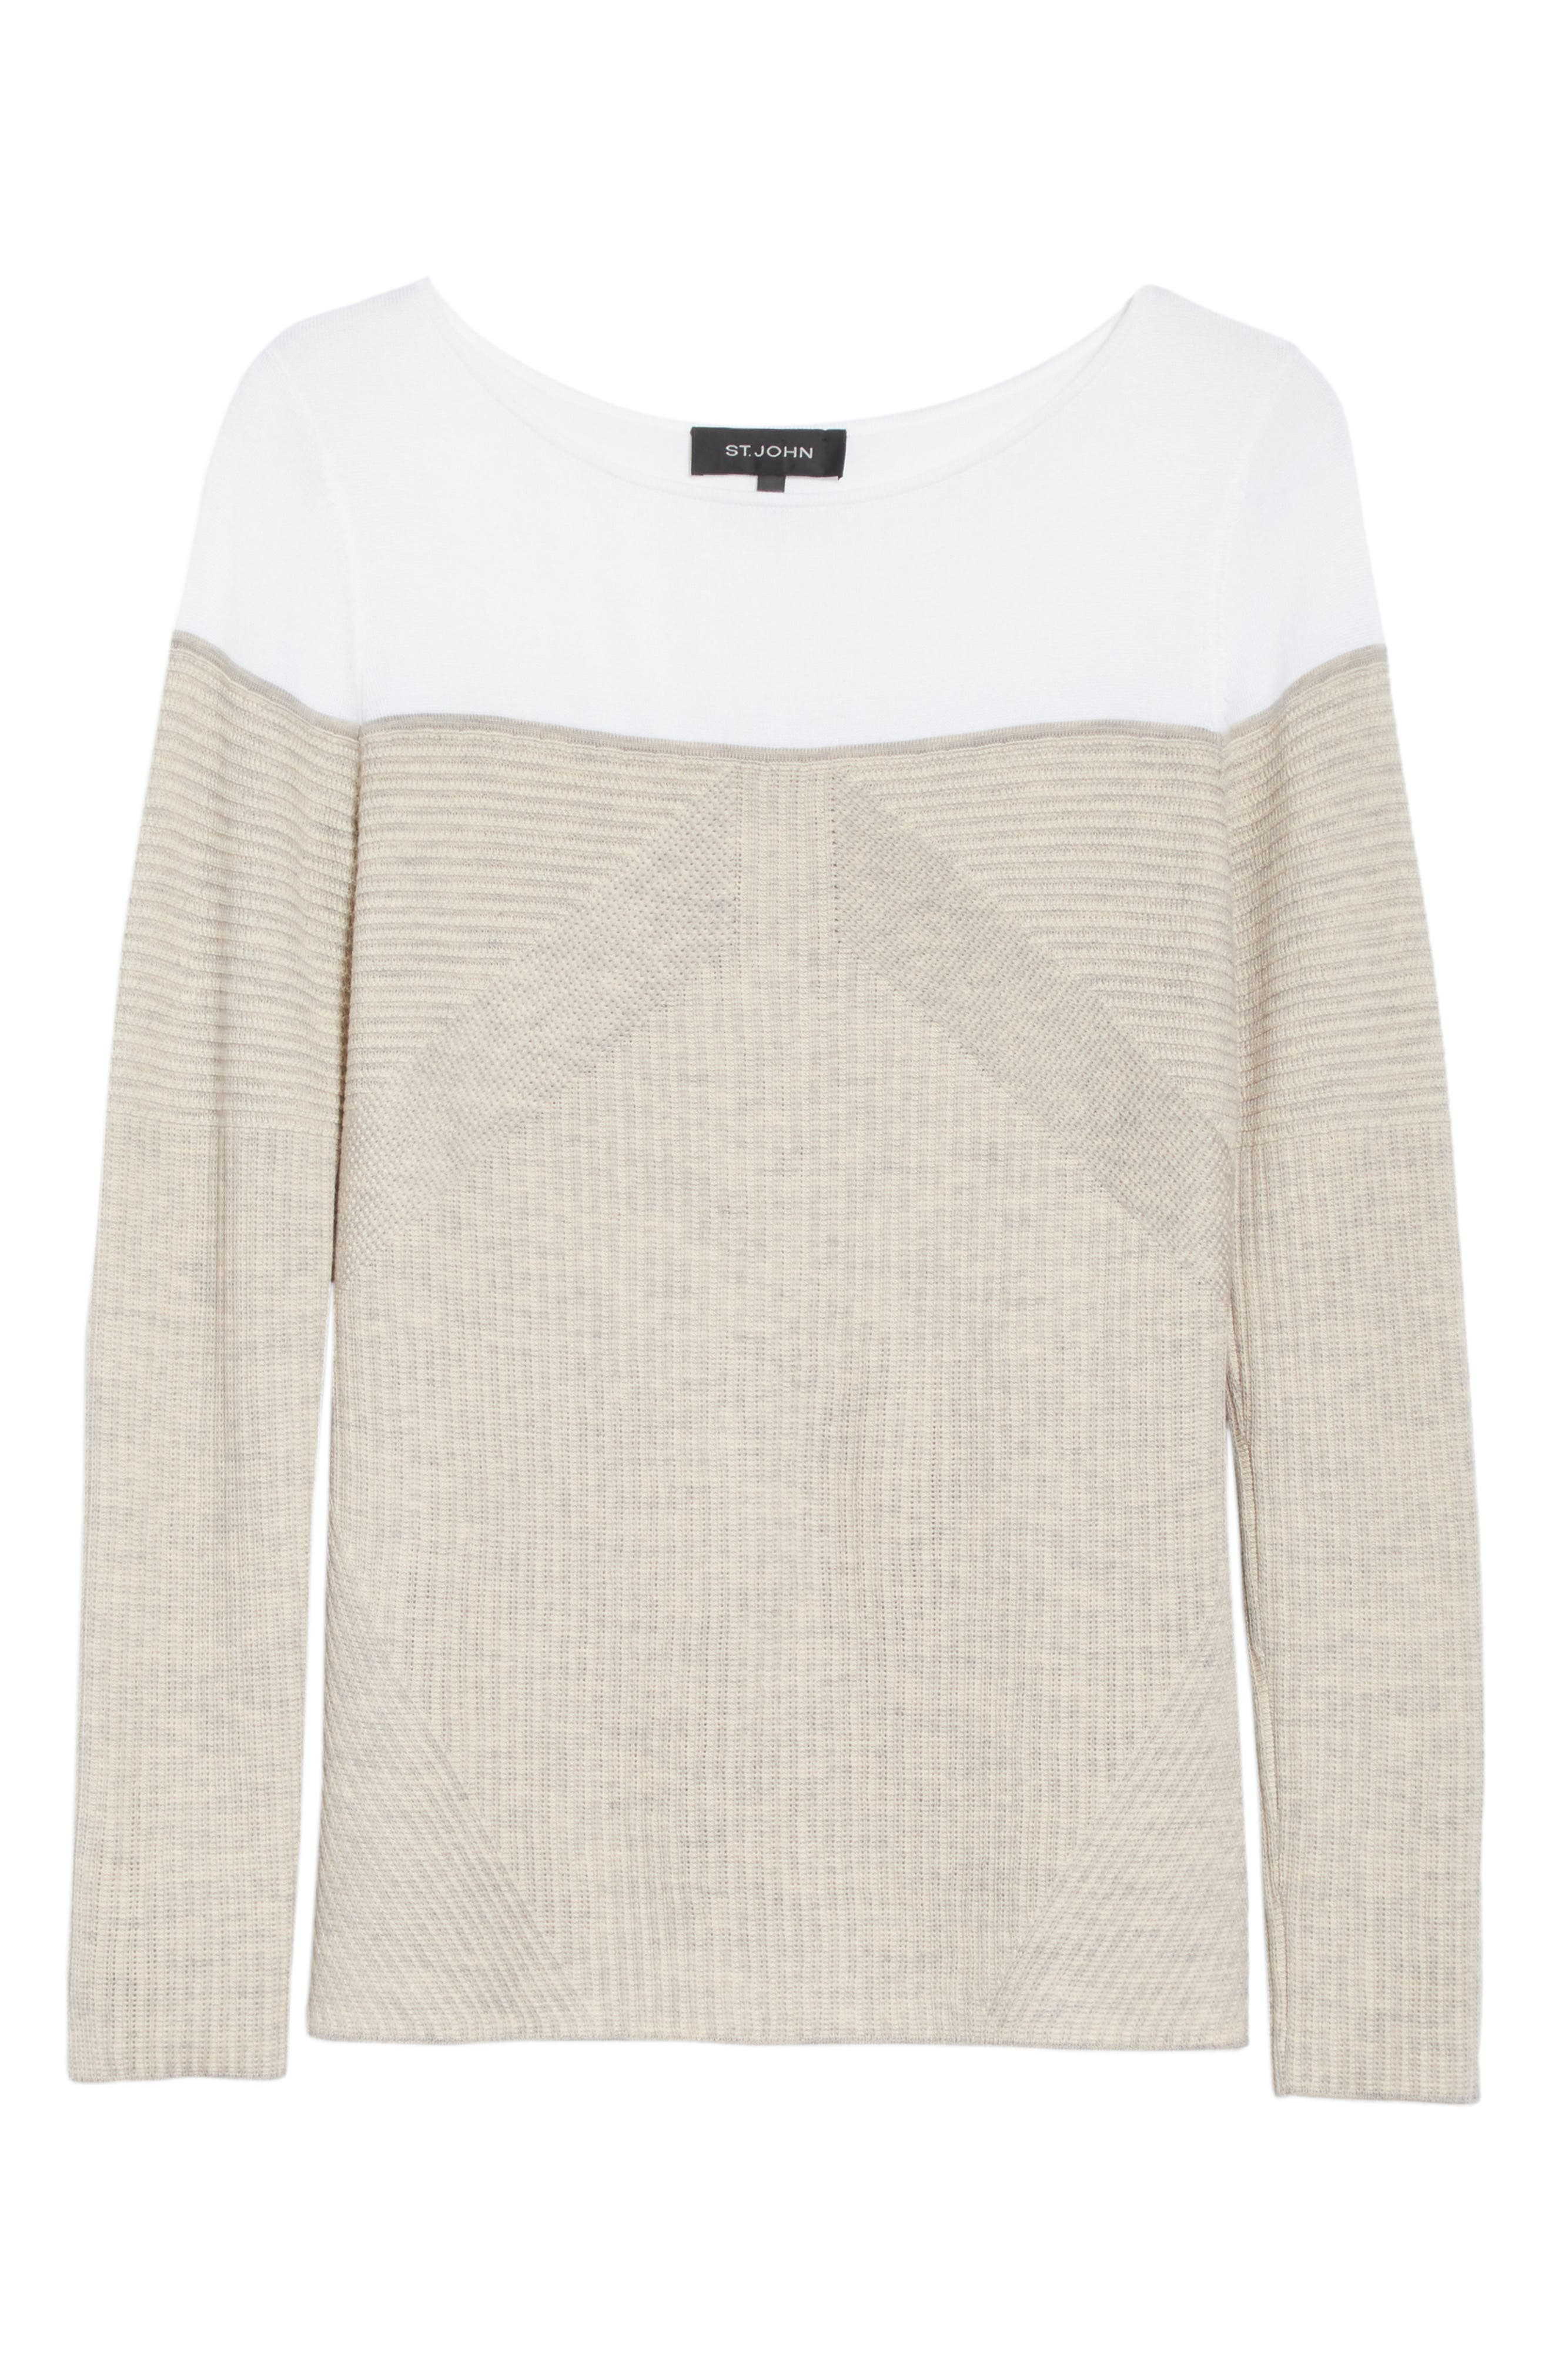 Tech Rib Knit Sweater,                             Alternate thumbnail 6, color,                             200